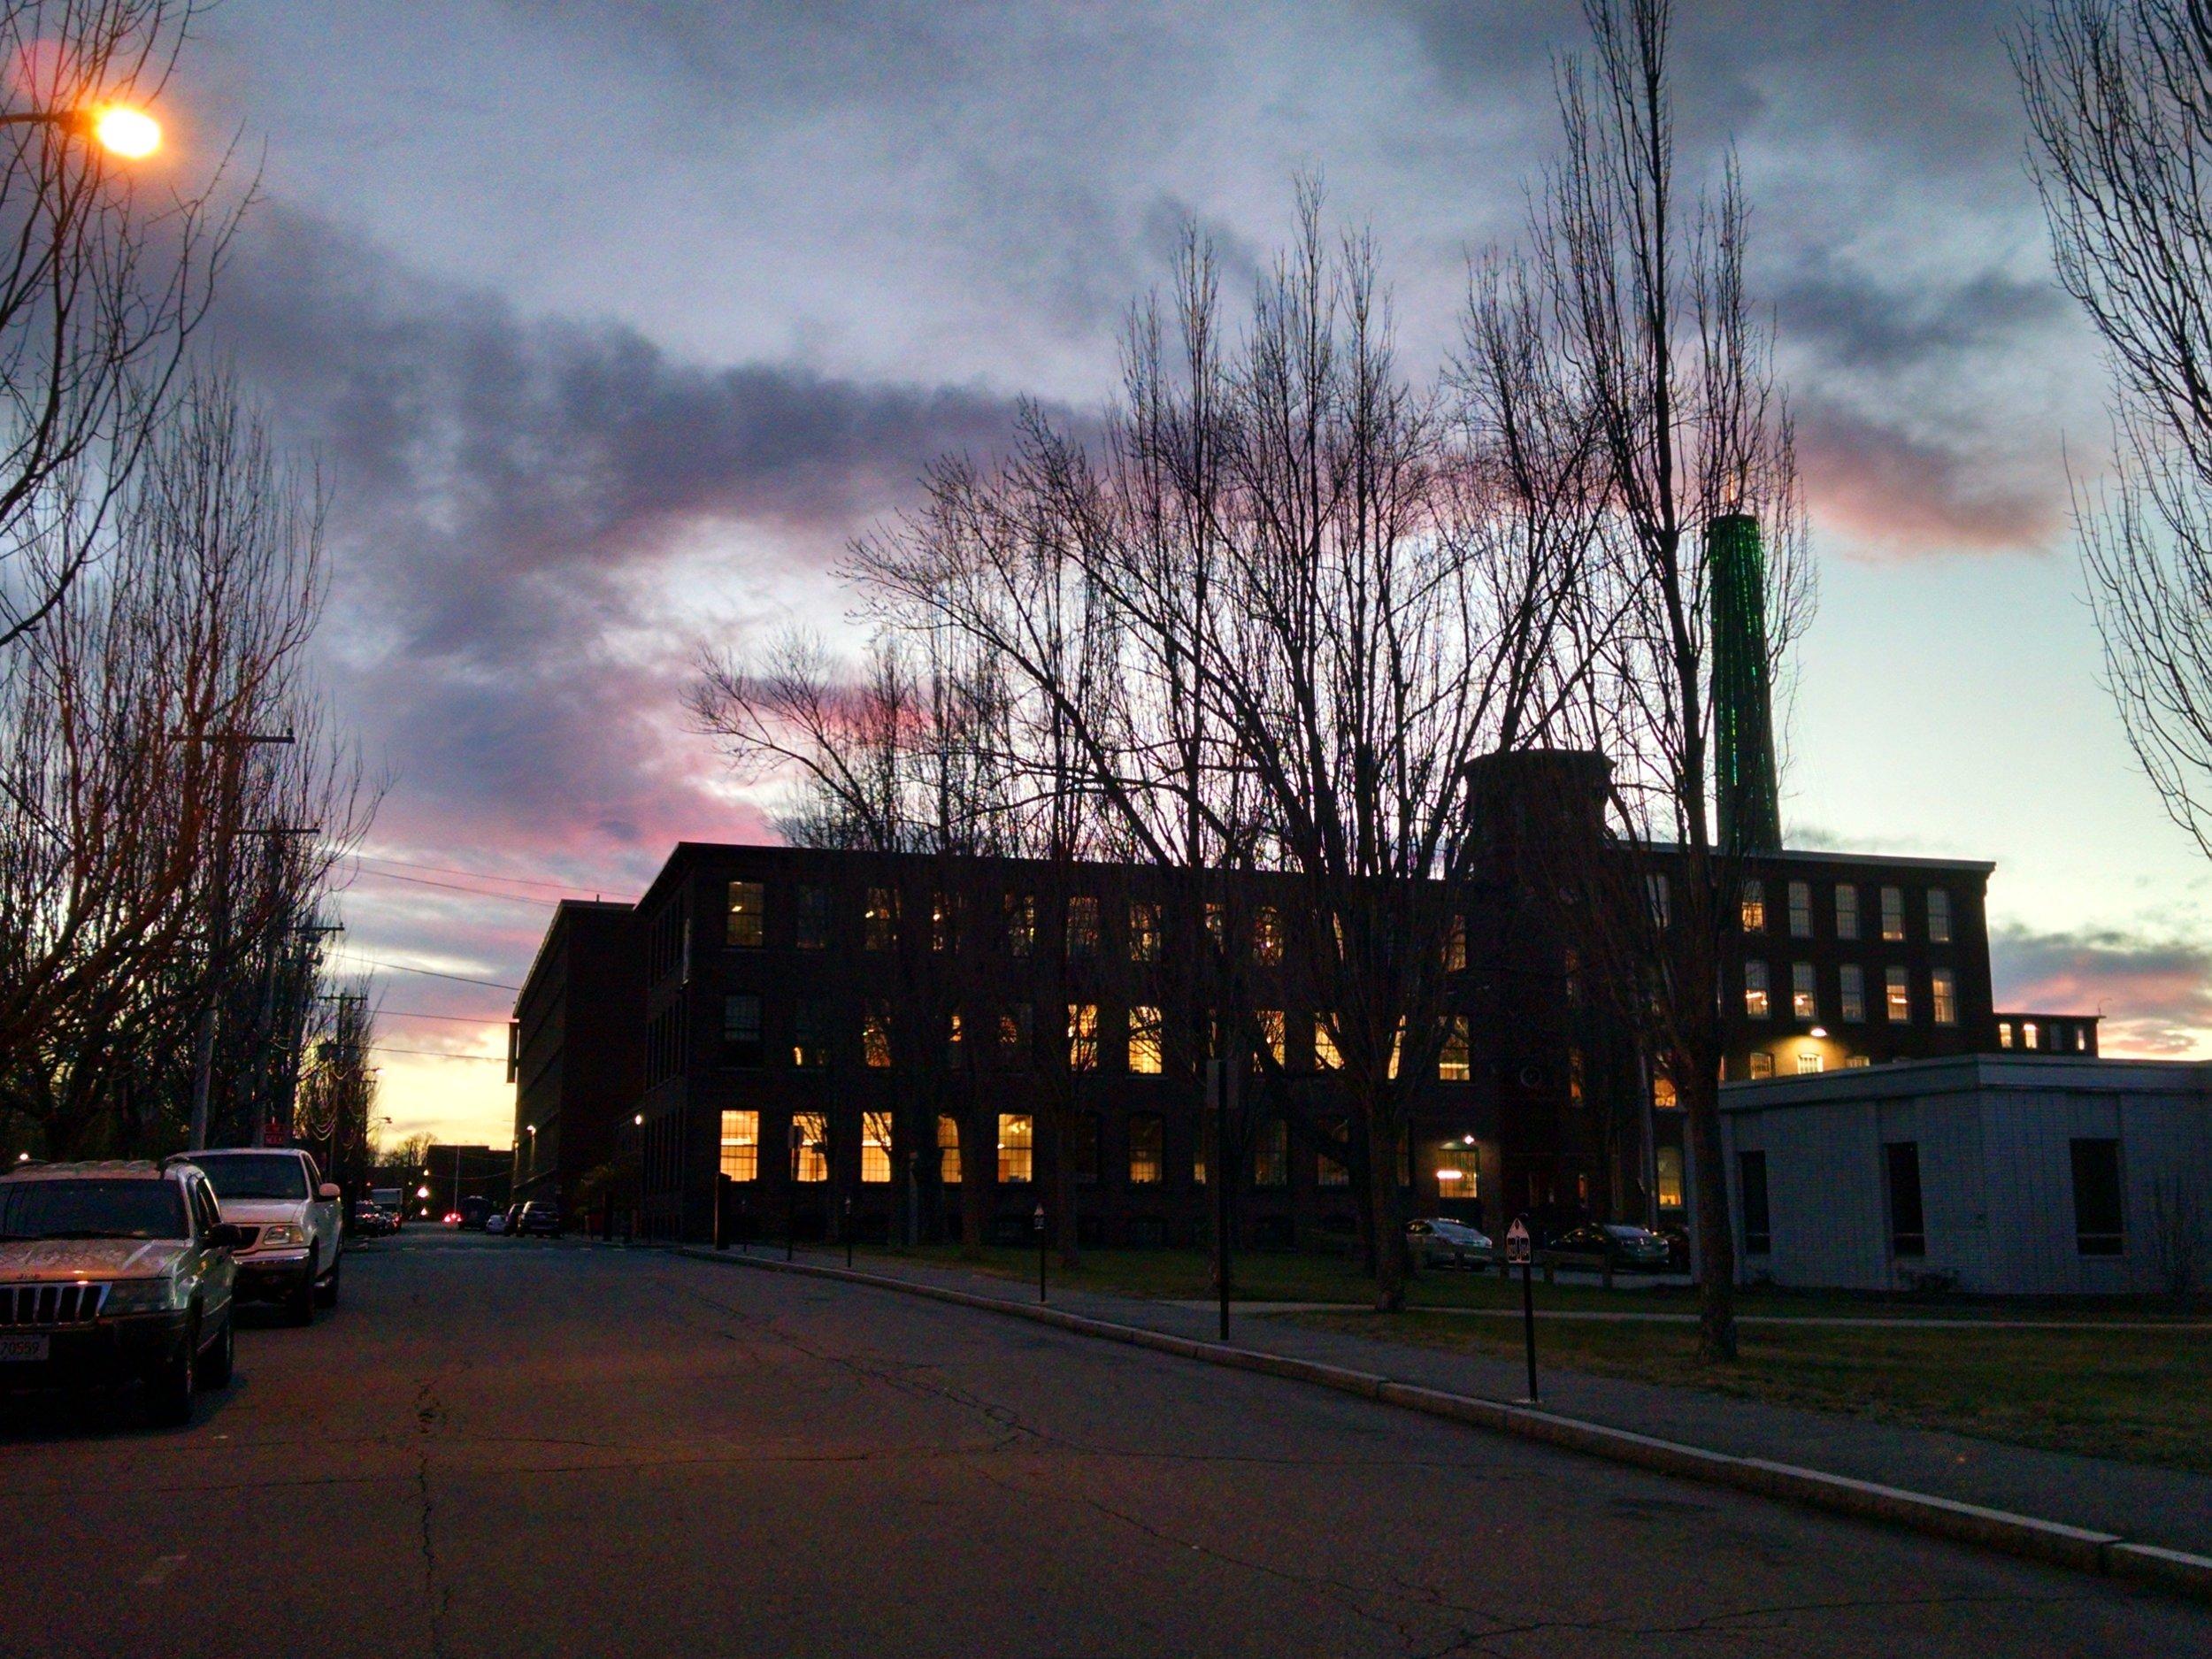 PERKINS ST SUNSET 2.jpg